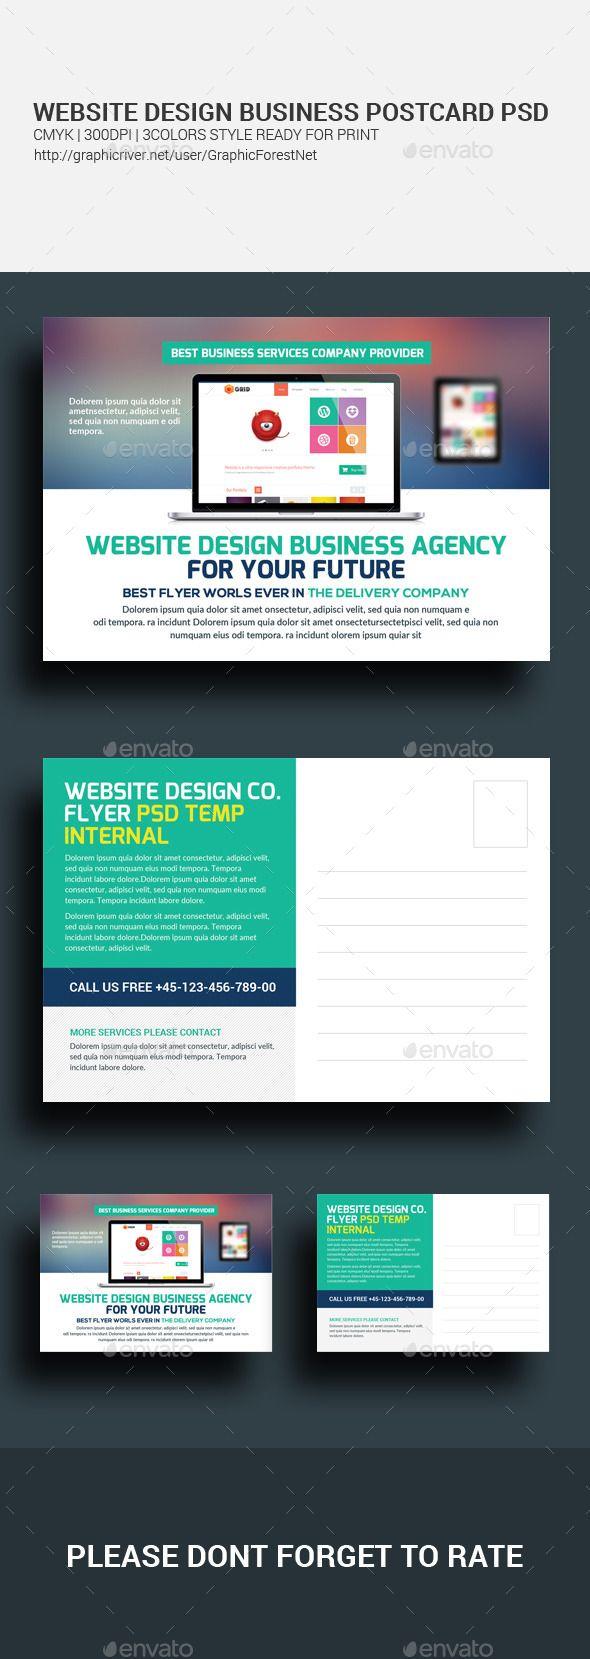 The 25+ best Business postcards ideas on Pinterest | Postcard ...